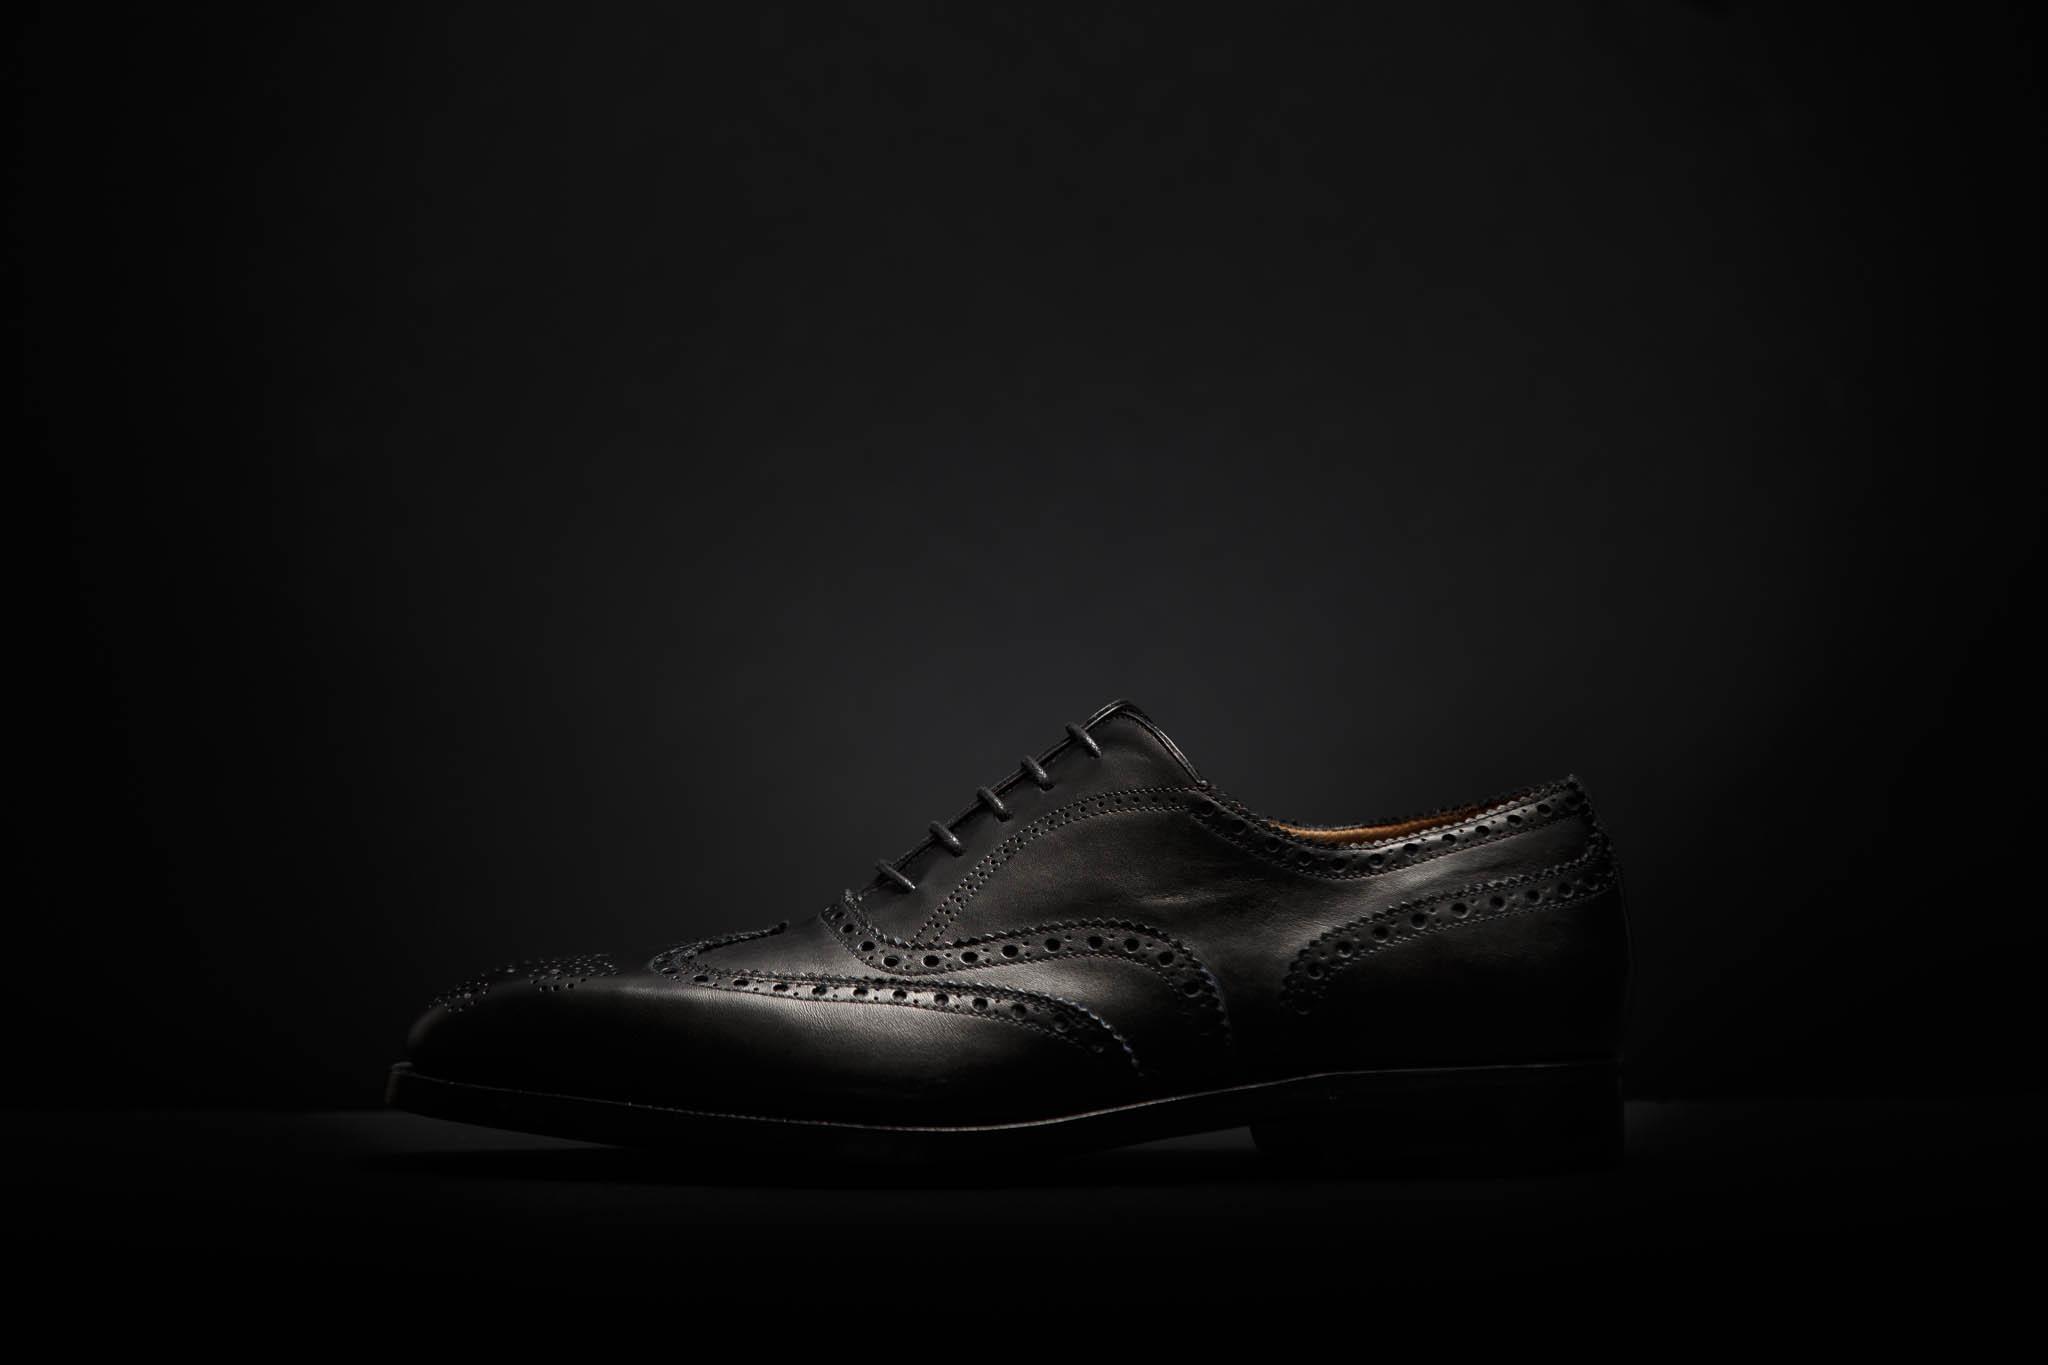 170729_Archibald_Shoes_010.jpg